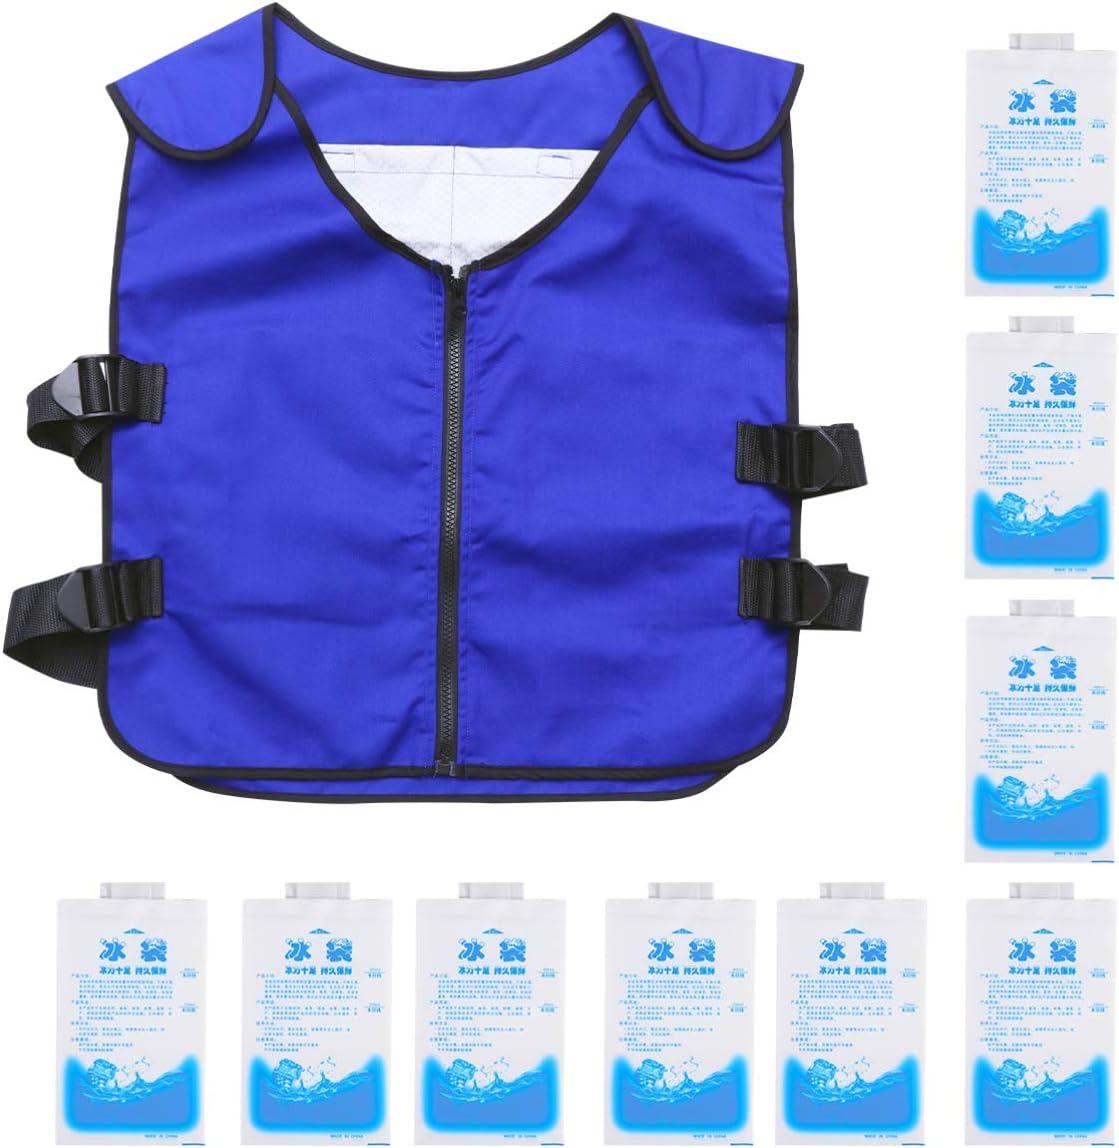 BESPORTBLE 21pcs Cooling Vest 誕生日/お祝い Ice 出群 Summer Jacket Set